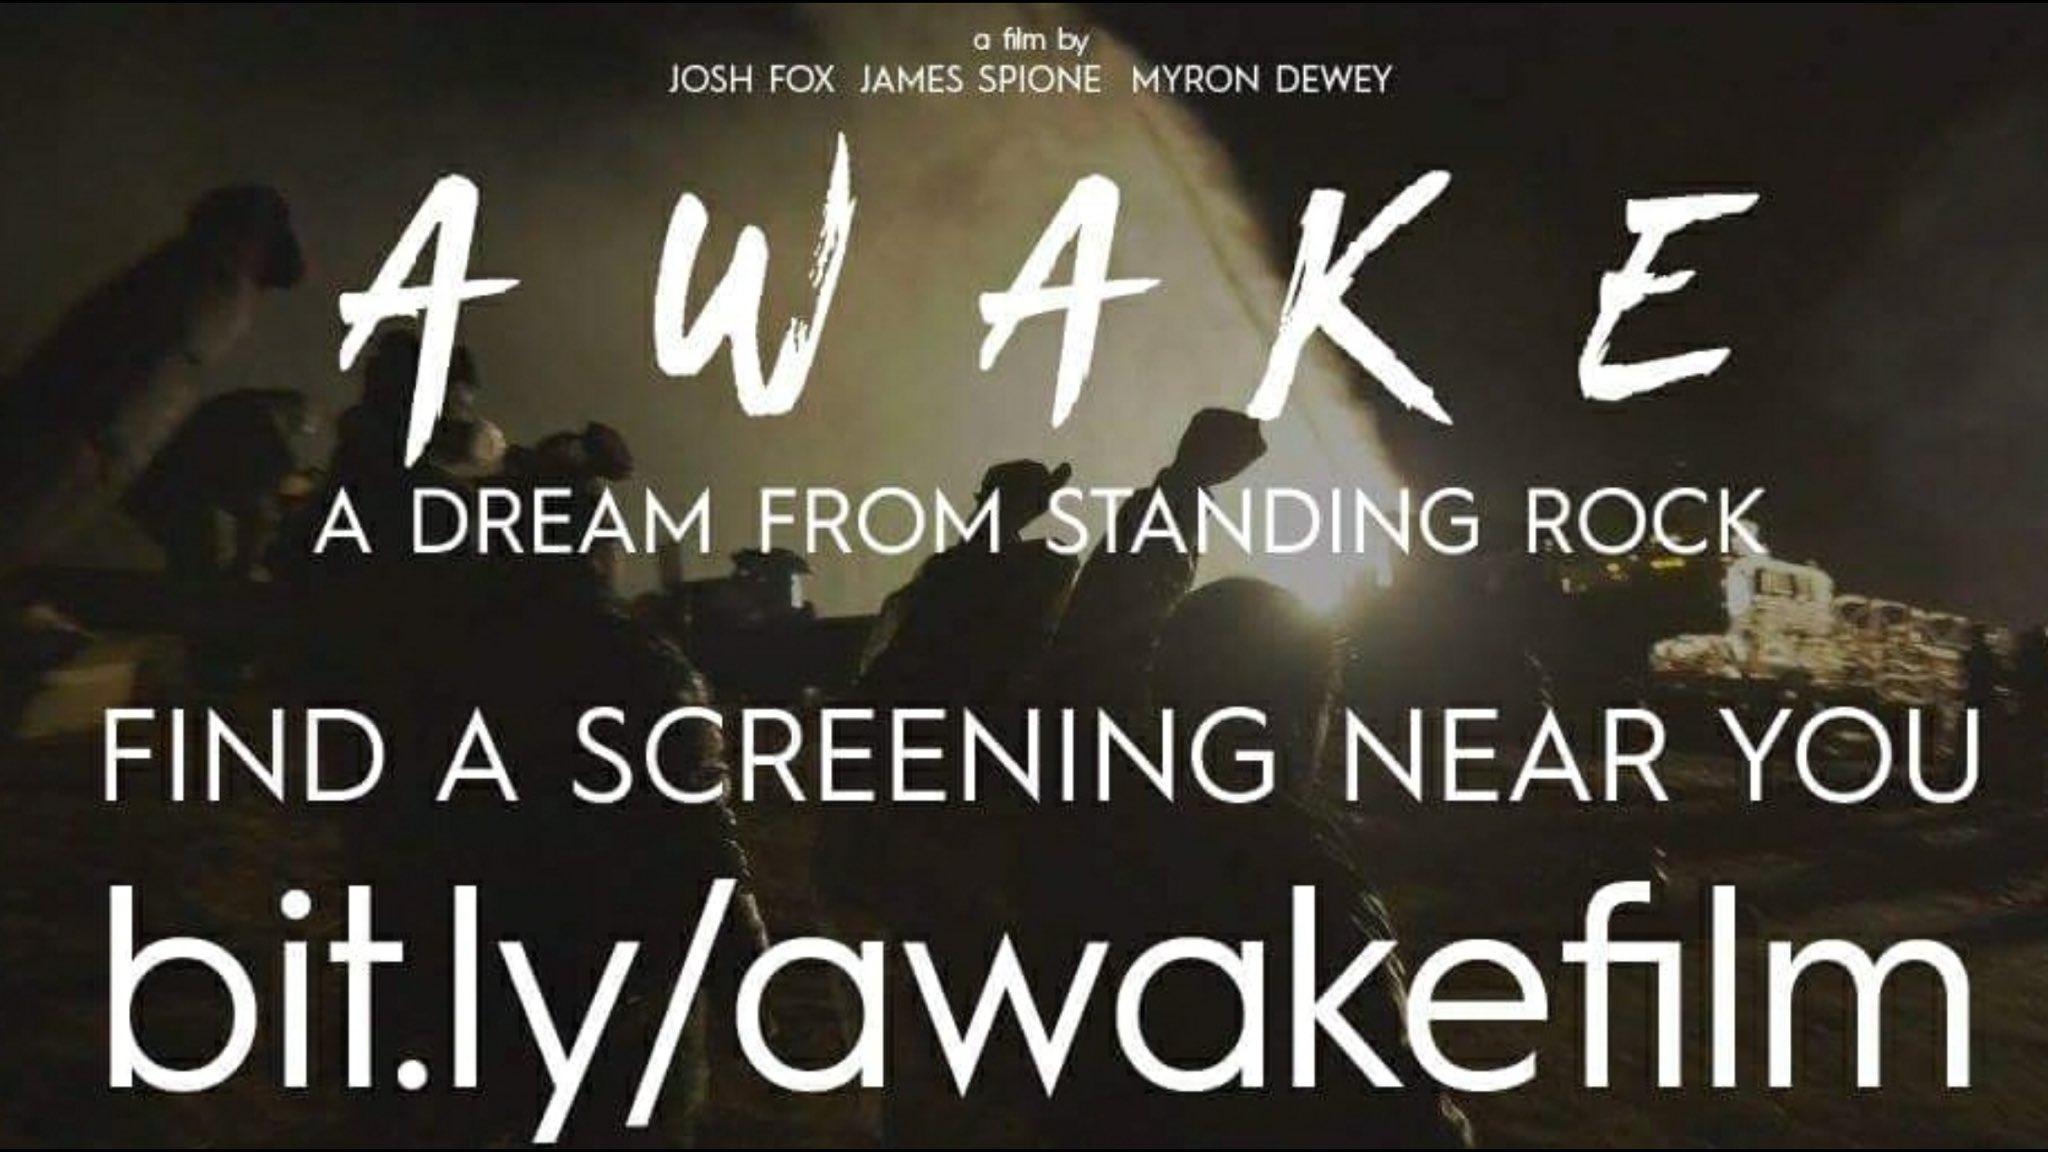 RT @joshfoxfilm: ONLY 2 MORE DAYS TIL AWAKE! @Tribeca #NoDAPL #standingrock https://t.co/A44kRSGM3k